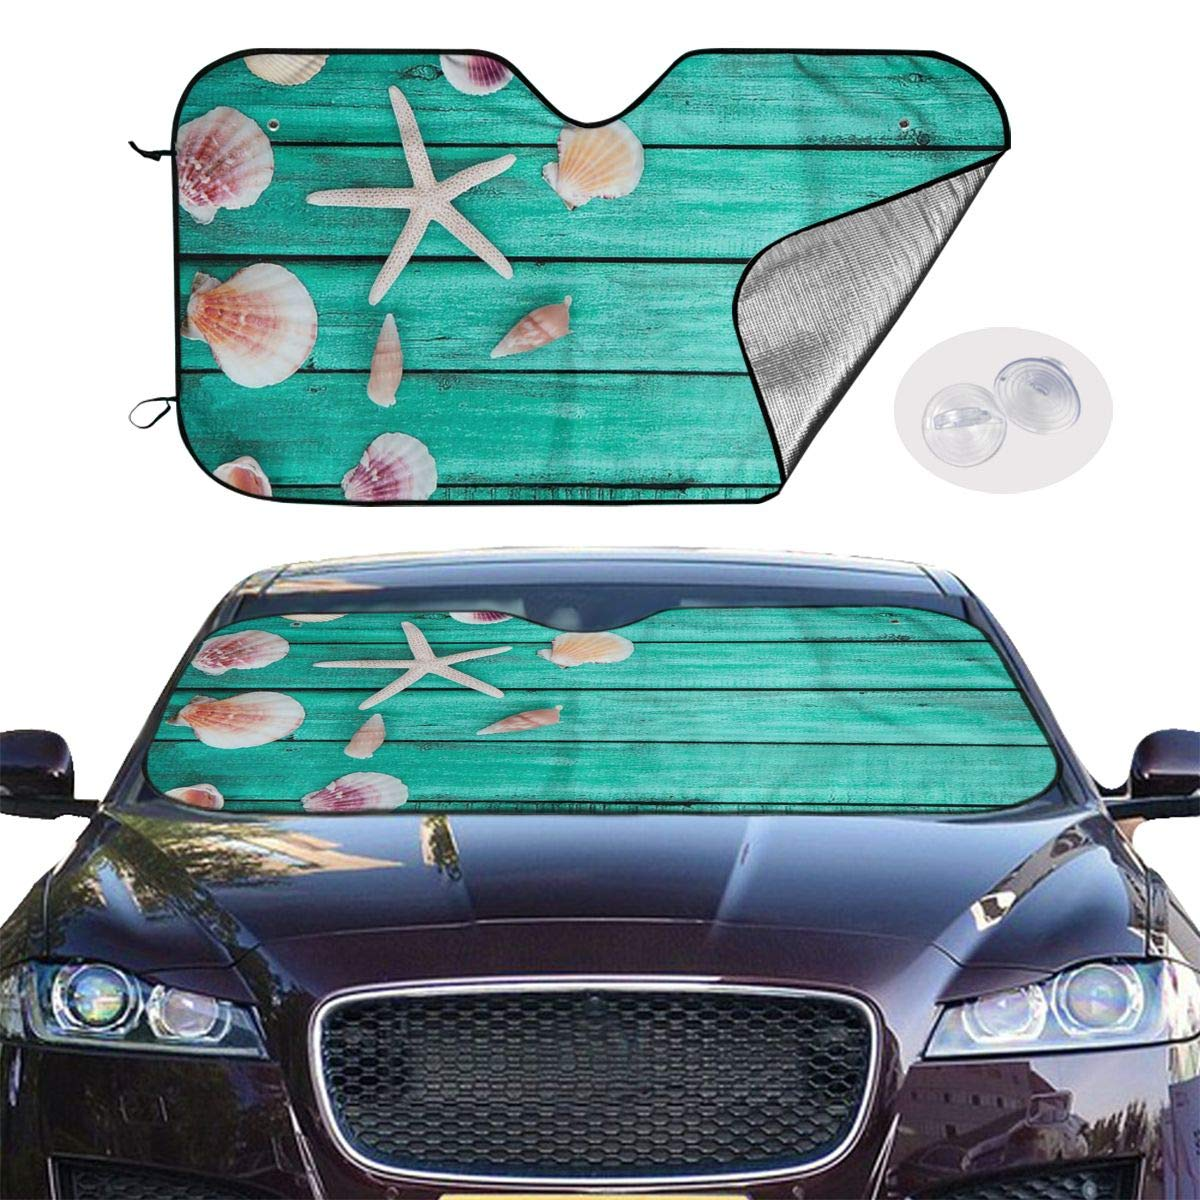 Windshield Sunshade for Car Foldable UV Ray Reflector Auto Front Window Sun Shade Visor Shield Cover, Keeps Vehicle Cool, Sea Shells by Sha-de